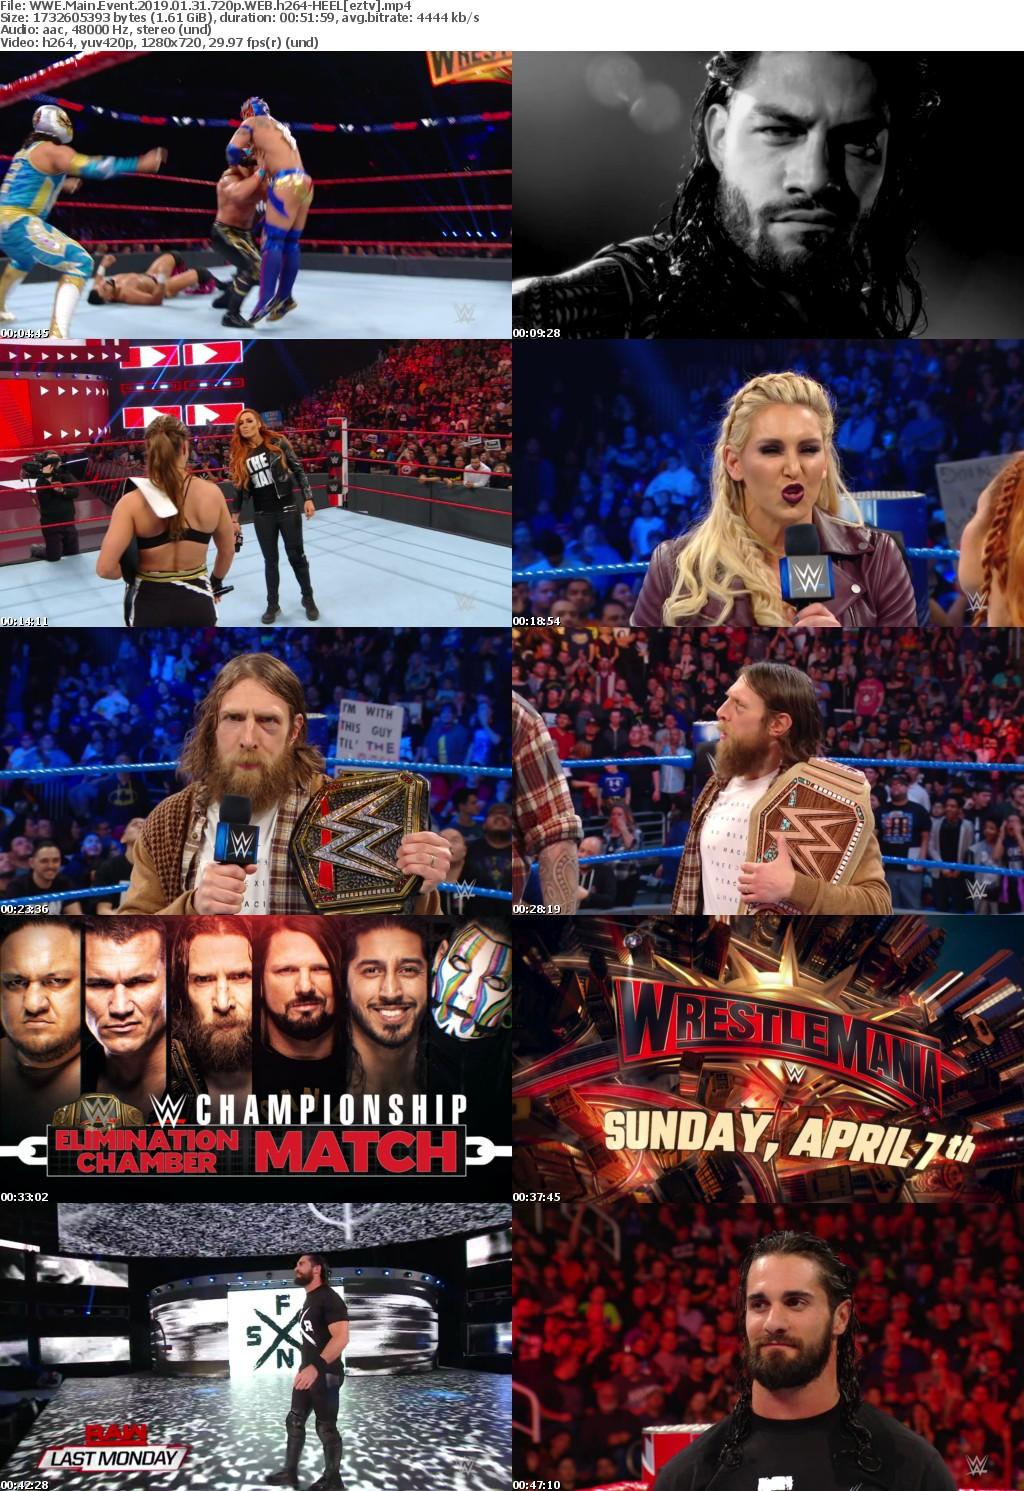 WWE Main Event (2019) 01 31 720p WEB h264-HEEL